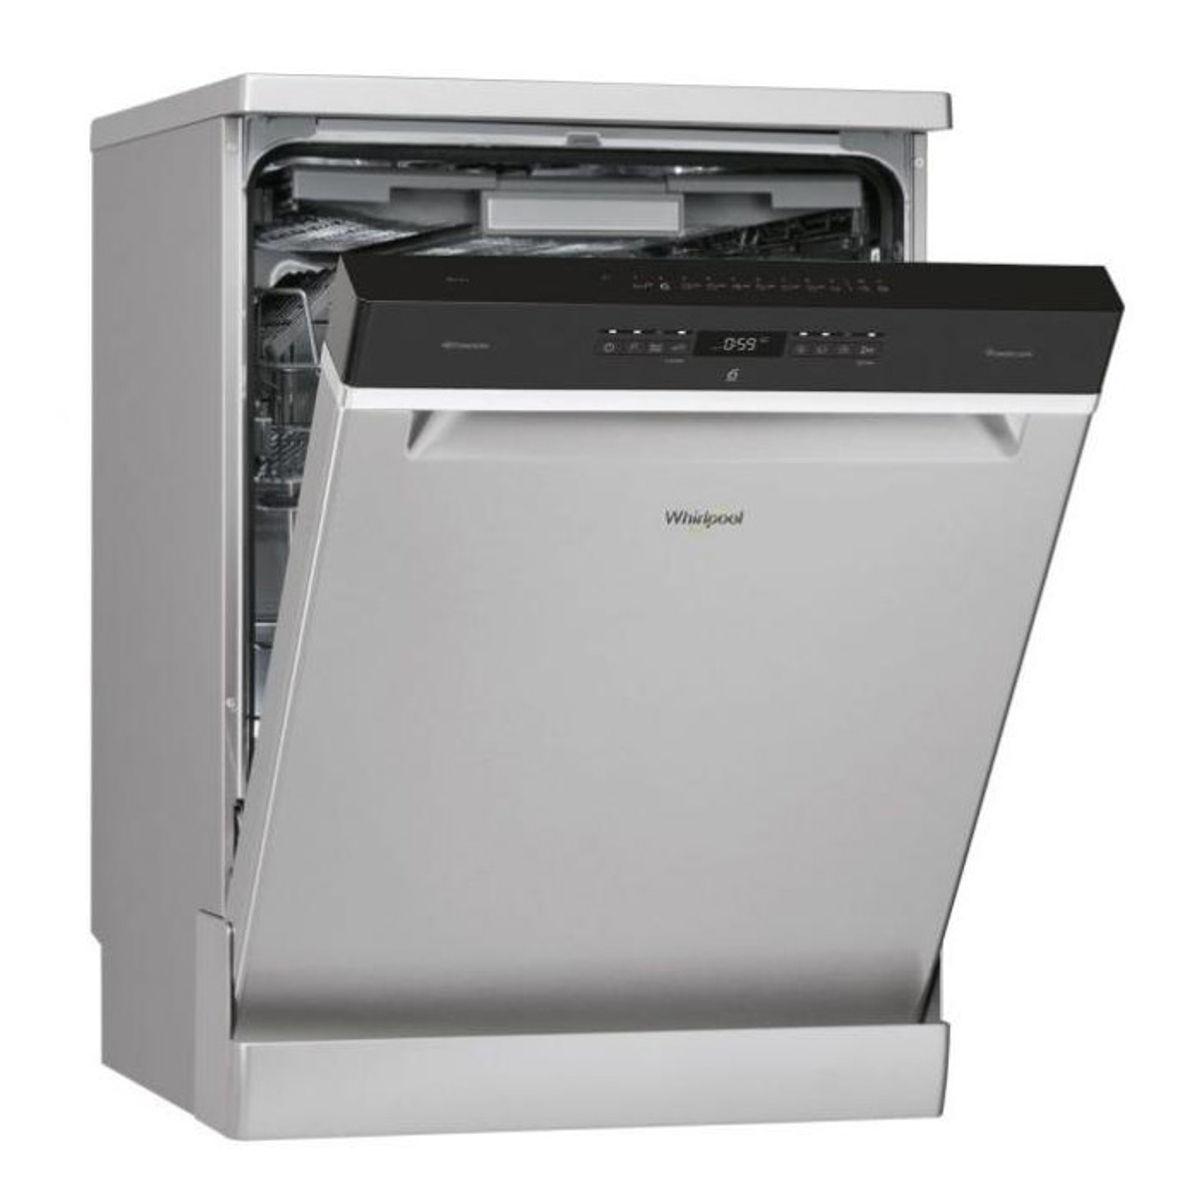 व्हर्लपूल PowerClean Pro Dishwasher